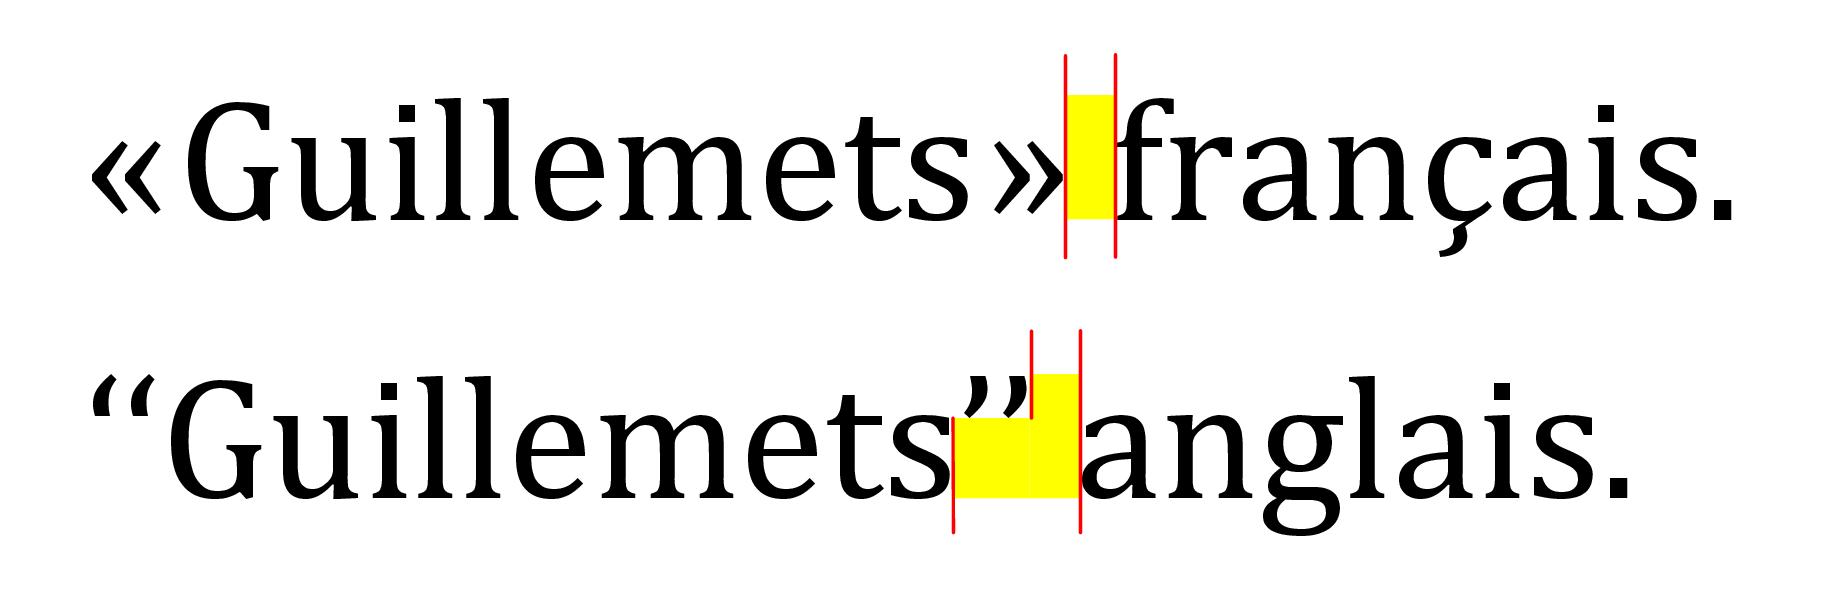 lankspaceinyellowprovokedbyelevatedquotationmarkssometypedesignersconsiderthisexcessive.